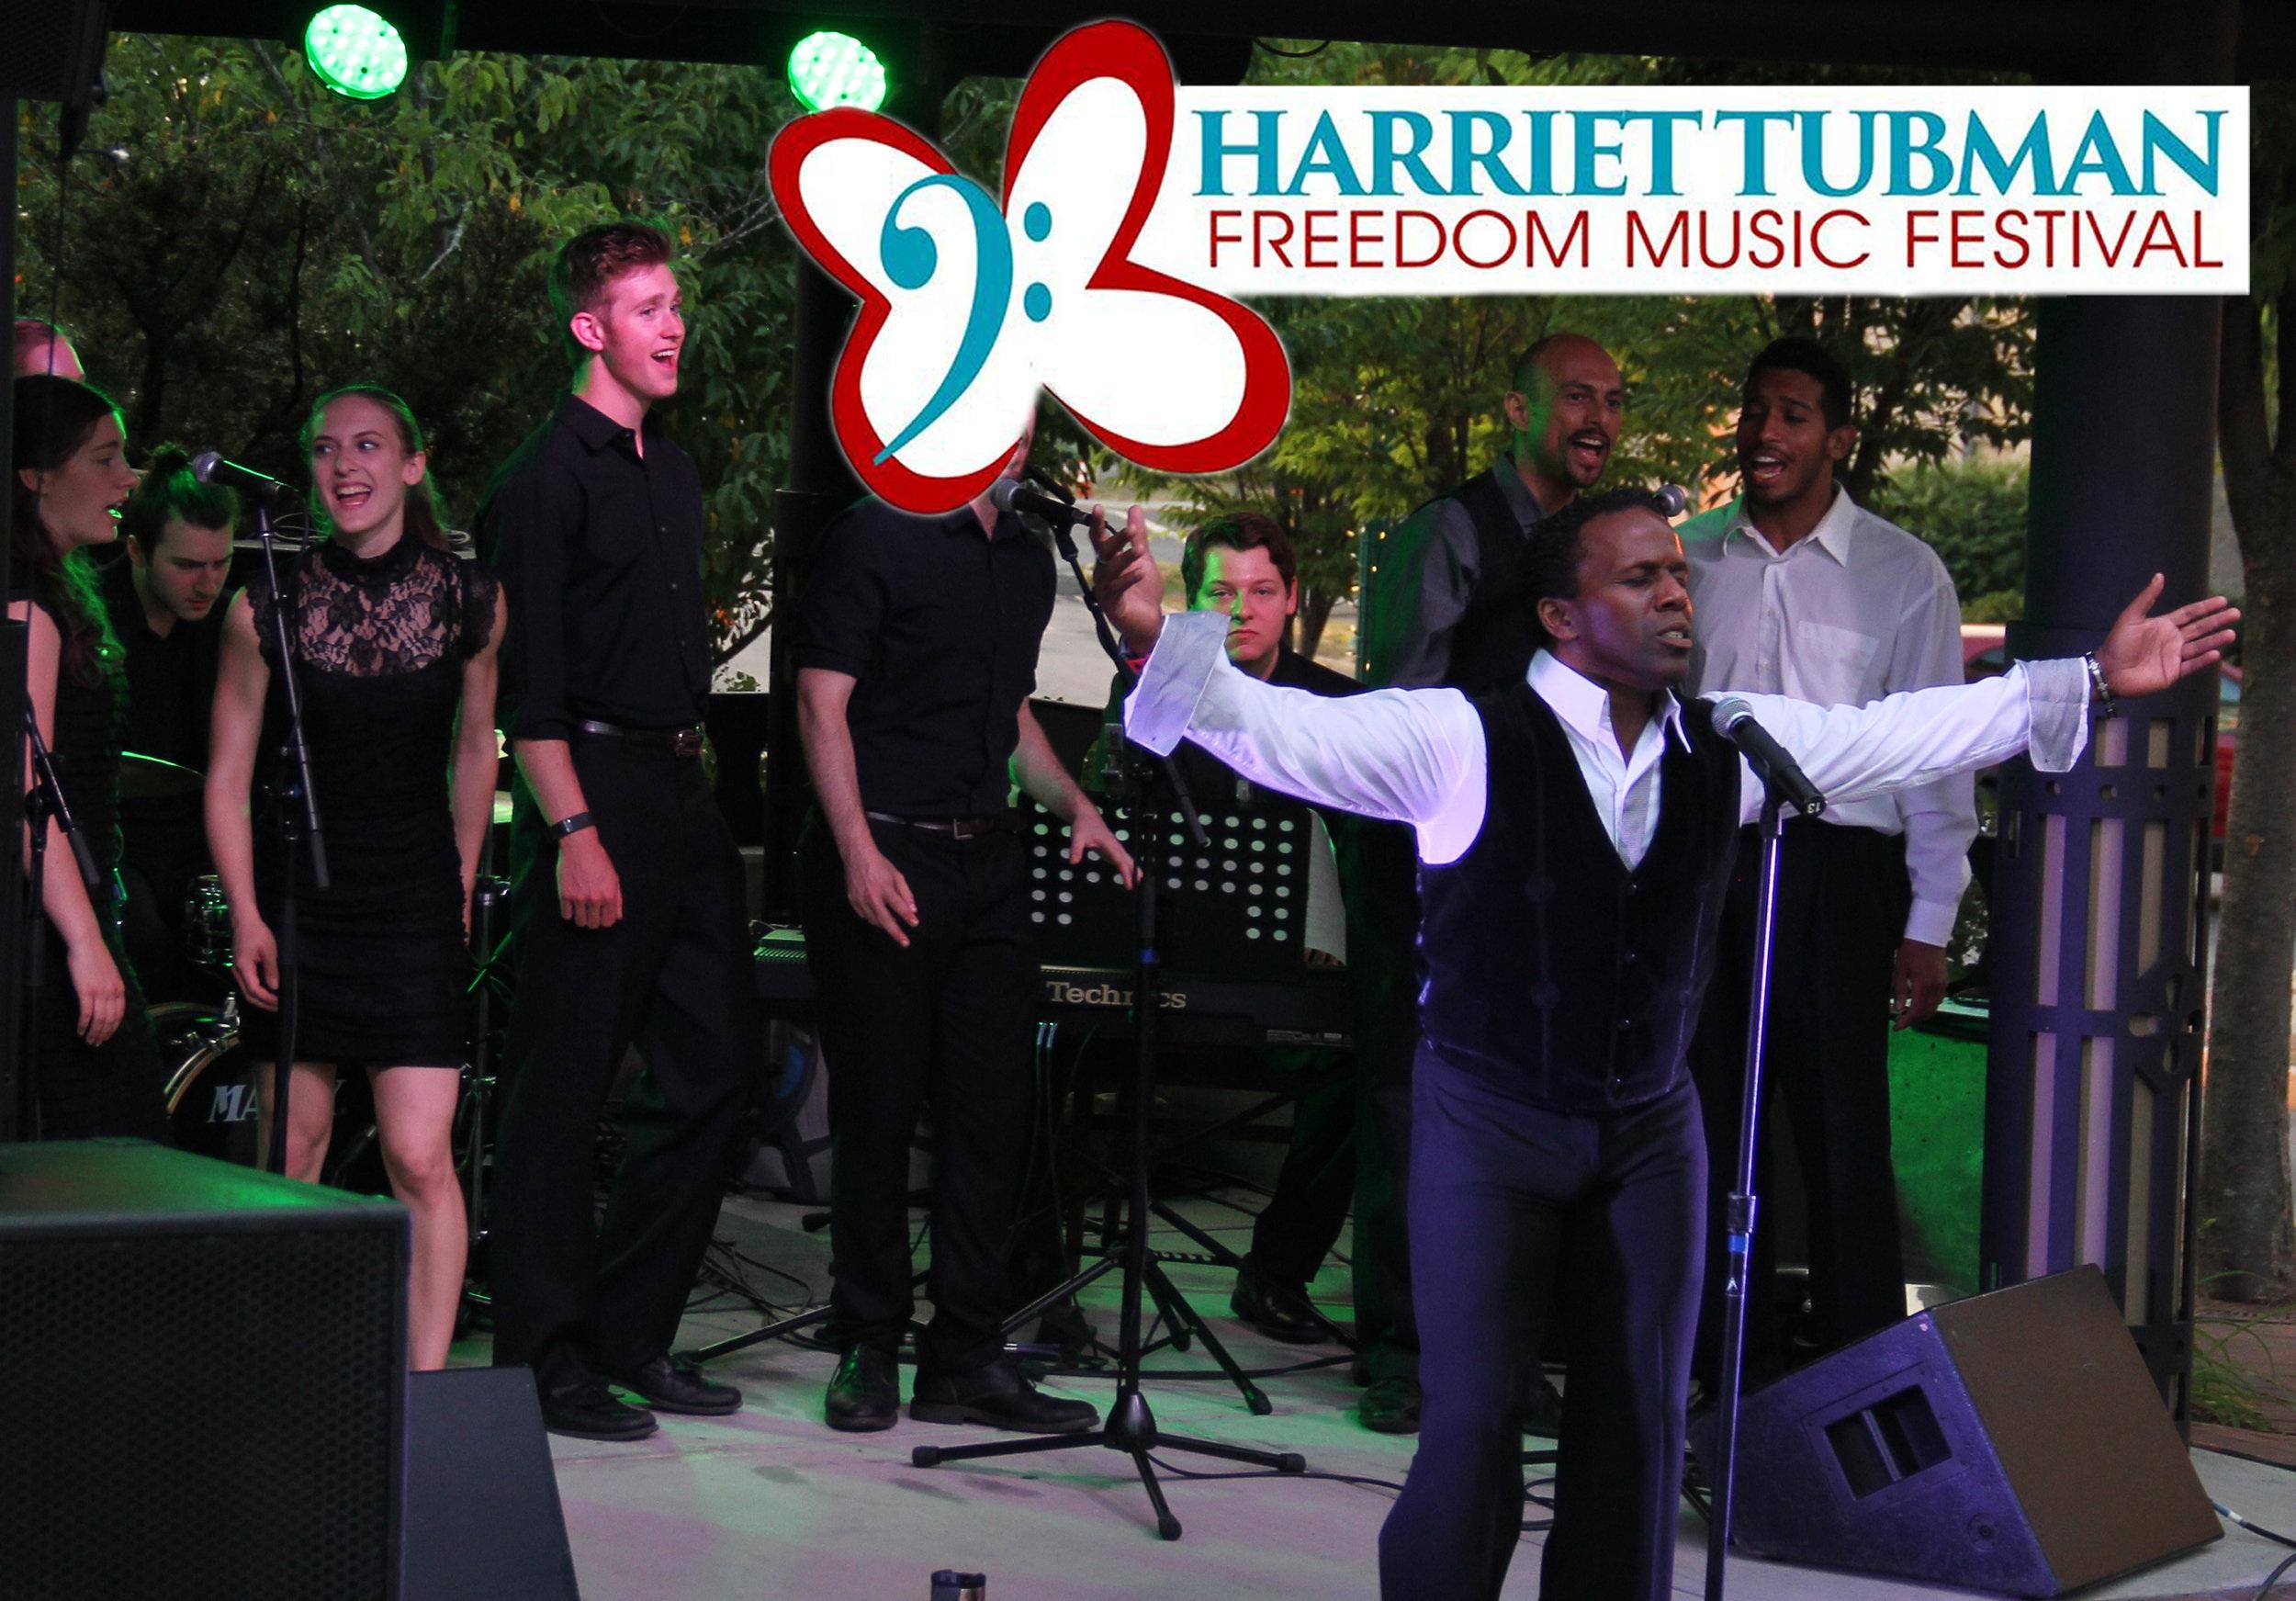 Harriet Tubman Freedom Music Festival - Sean McLeod - Arms Out - Logo.jpg